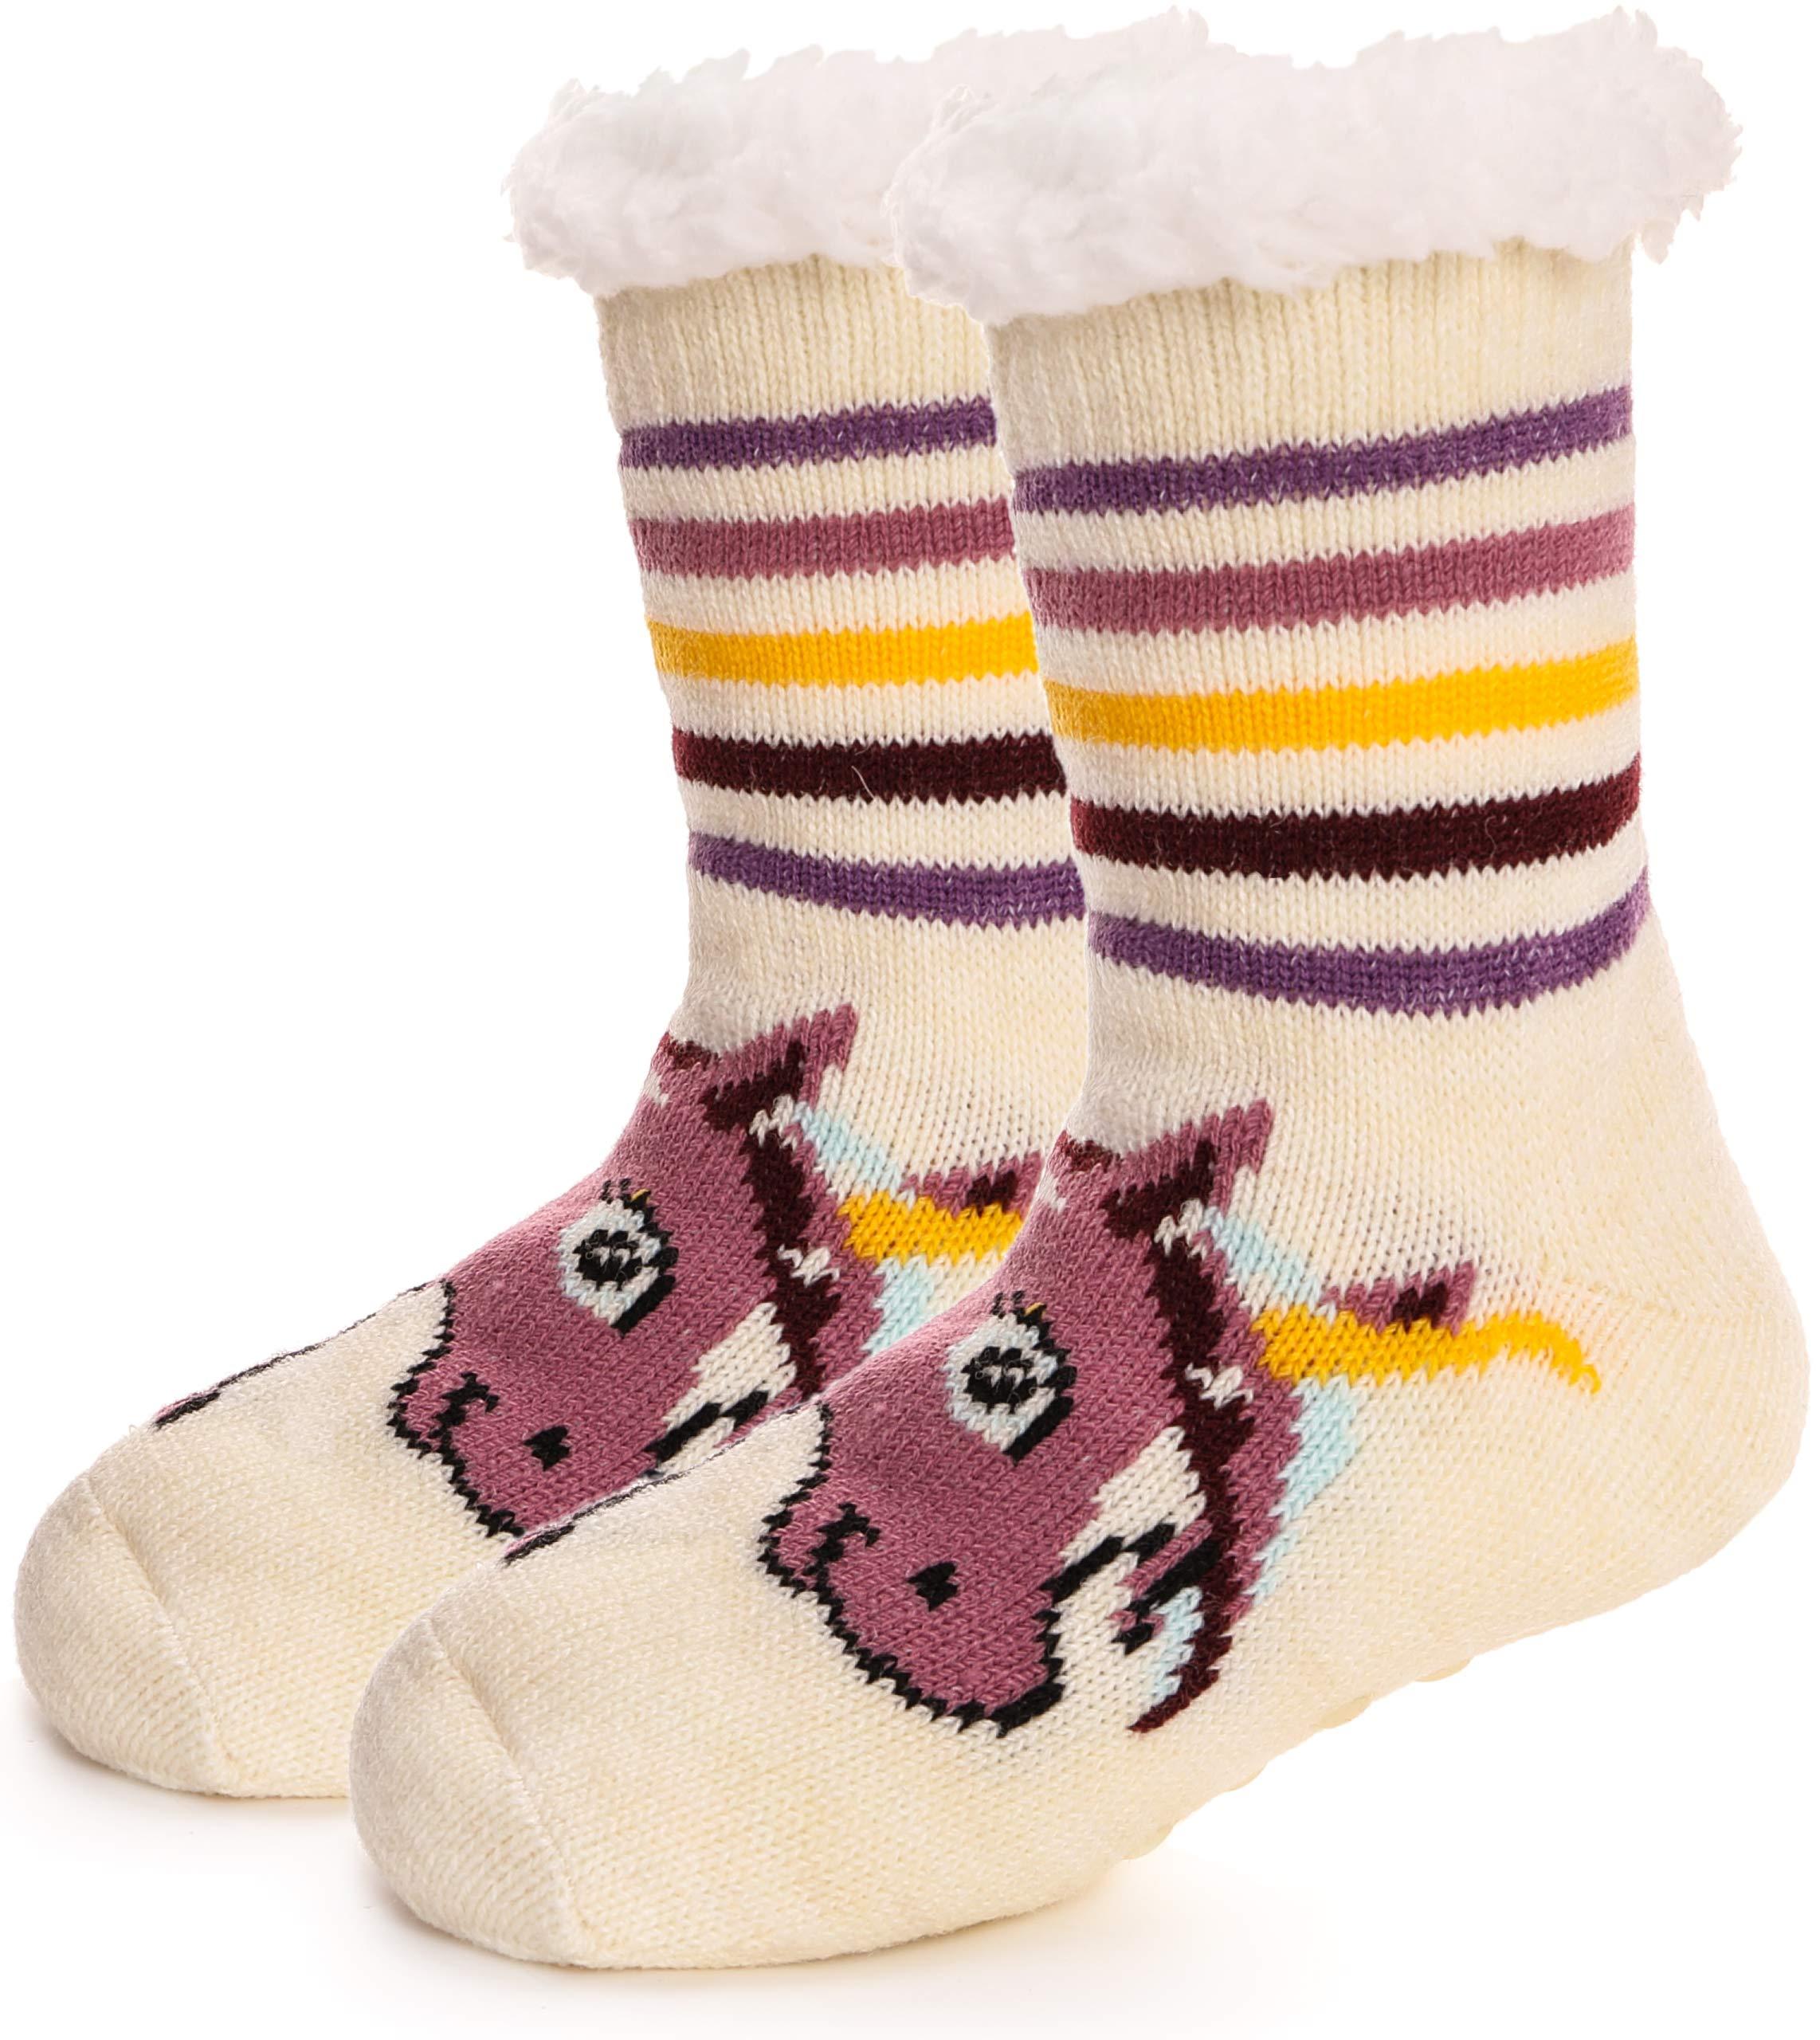 RONGBLUE Kids Boys Girls Christmas Fuzzy Slipper Socks Cute Animal Super Soft Warm Sherpa lining Non Skid Winter Socks